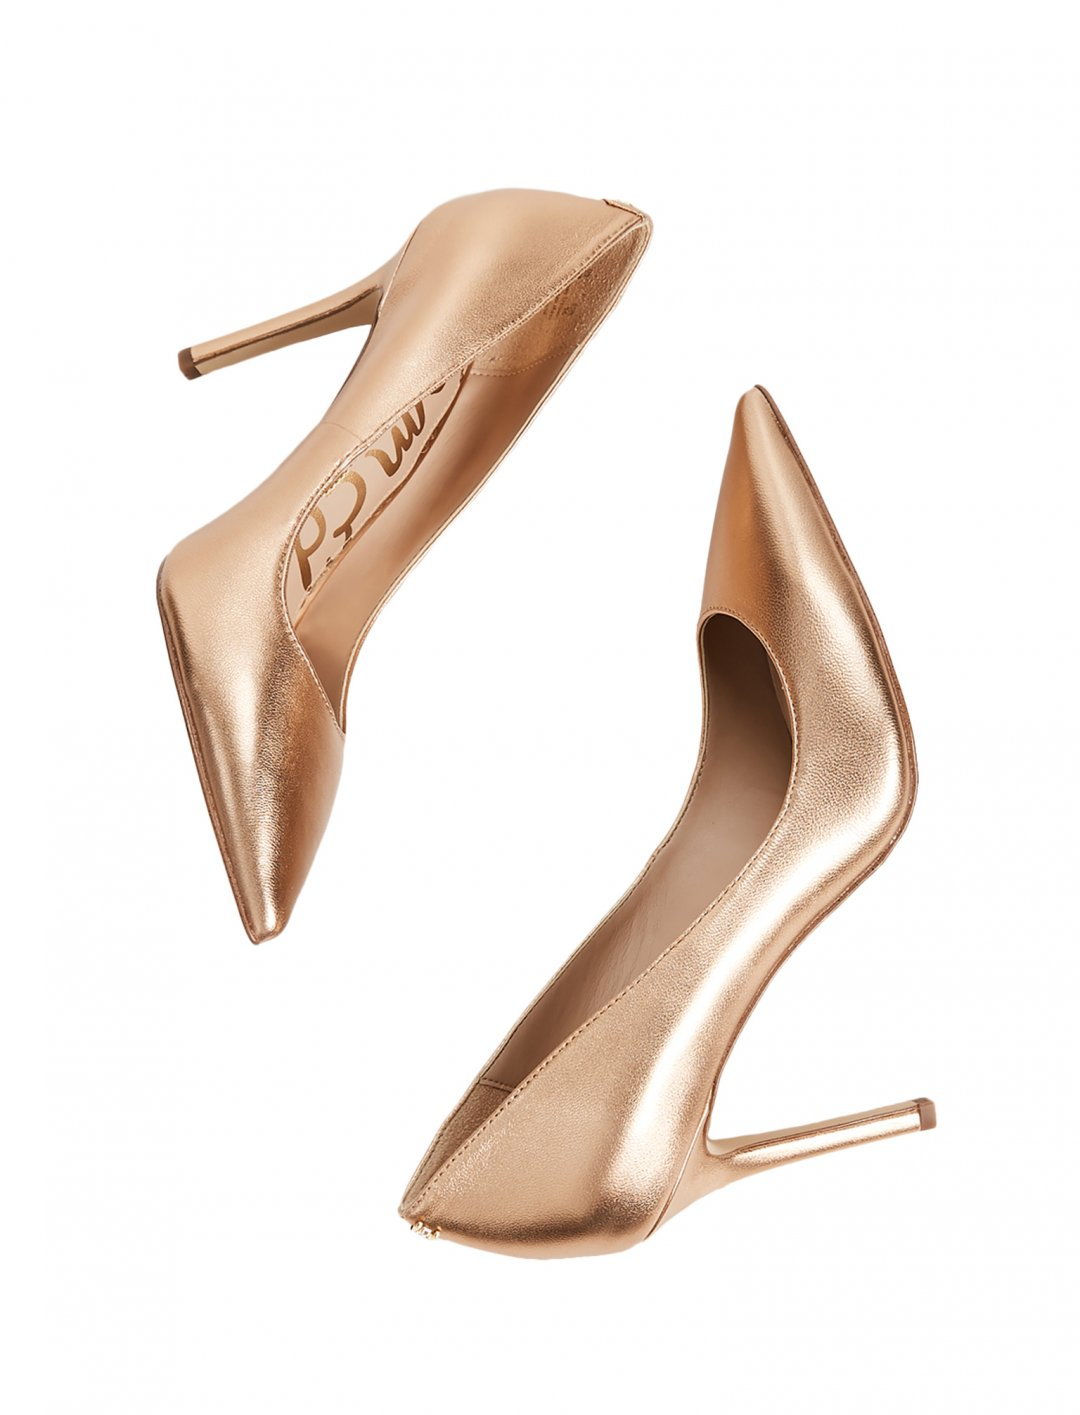 "Sam Edelman Hazel Pumps {""id"":12,""product_section_id"":1,""name"":""Shoes"",""order"":12} Sam Edelman"